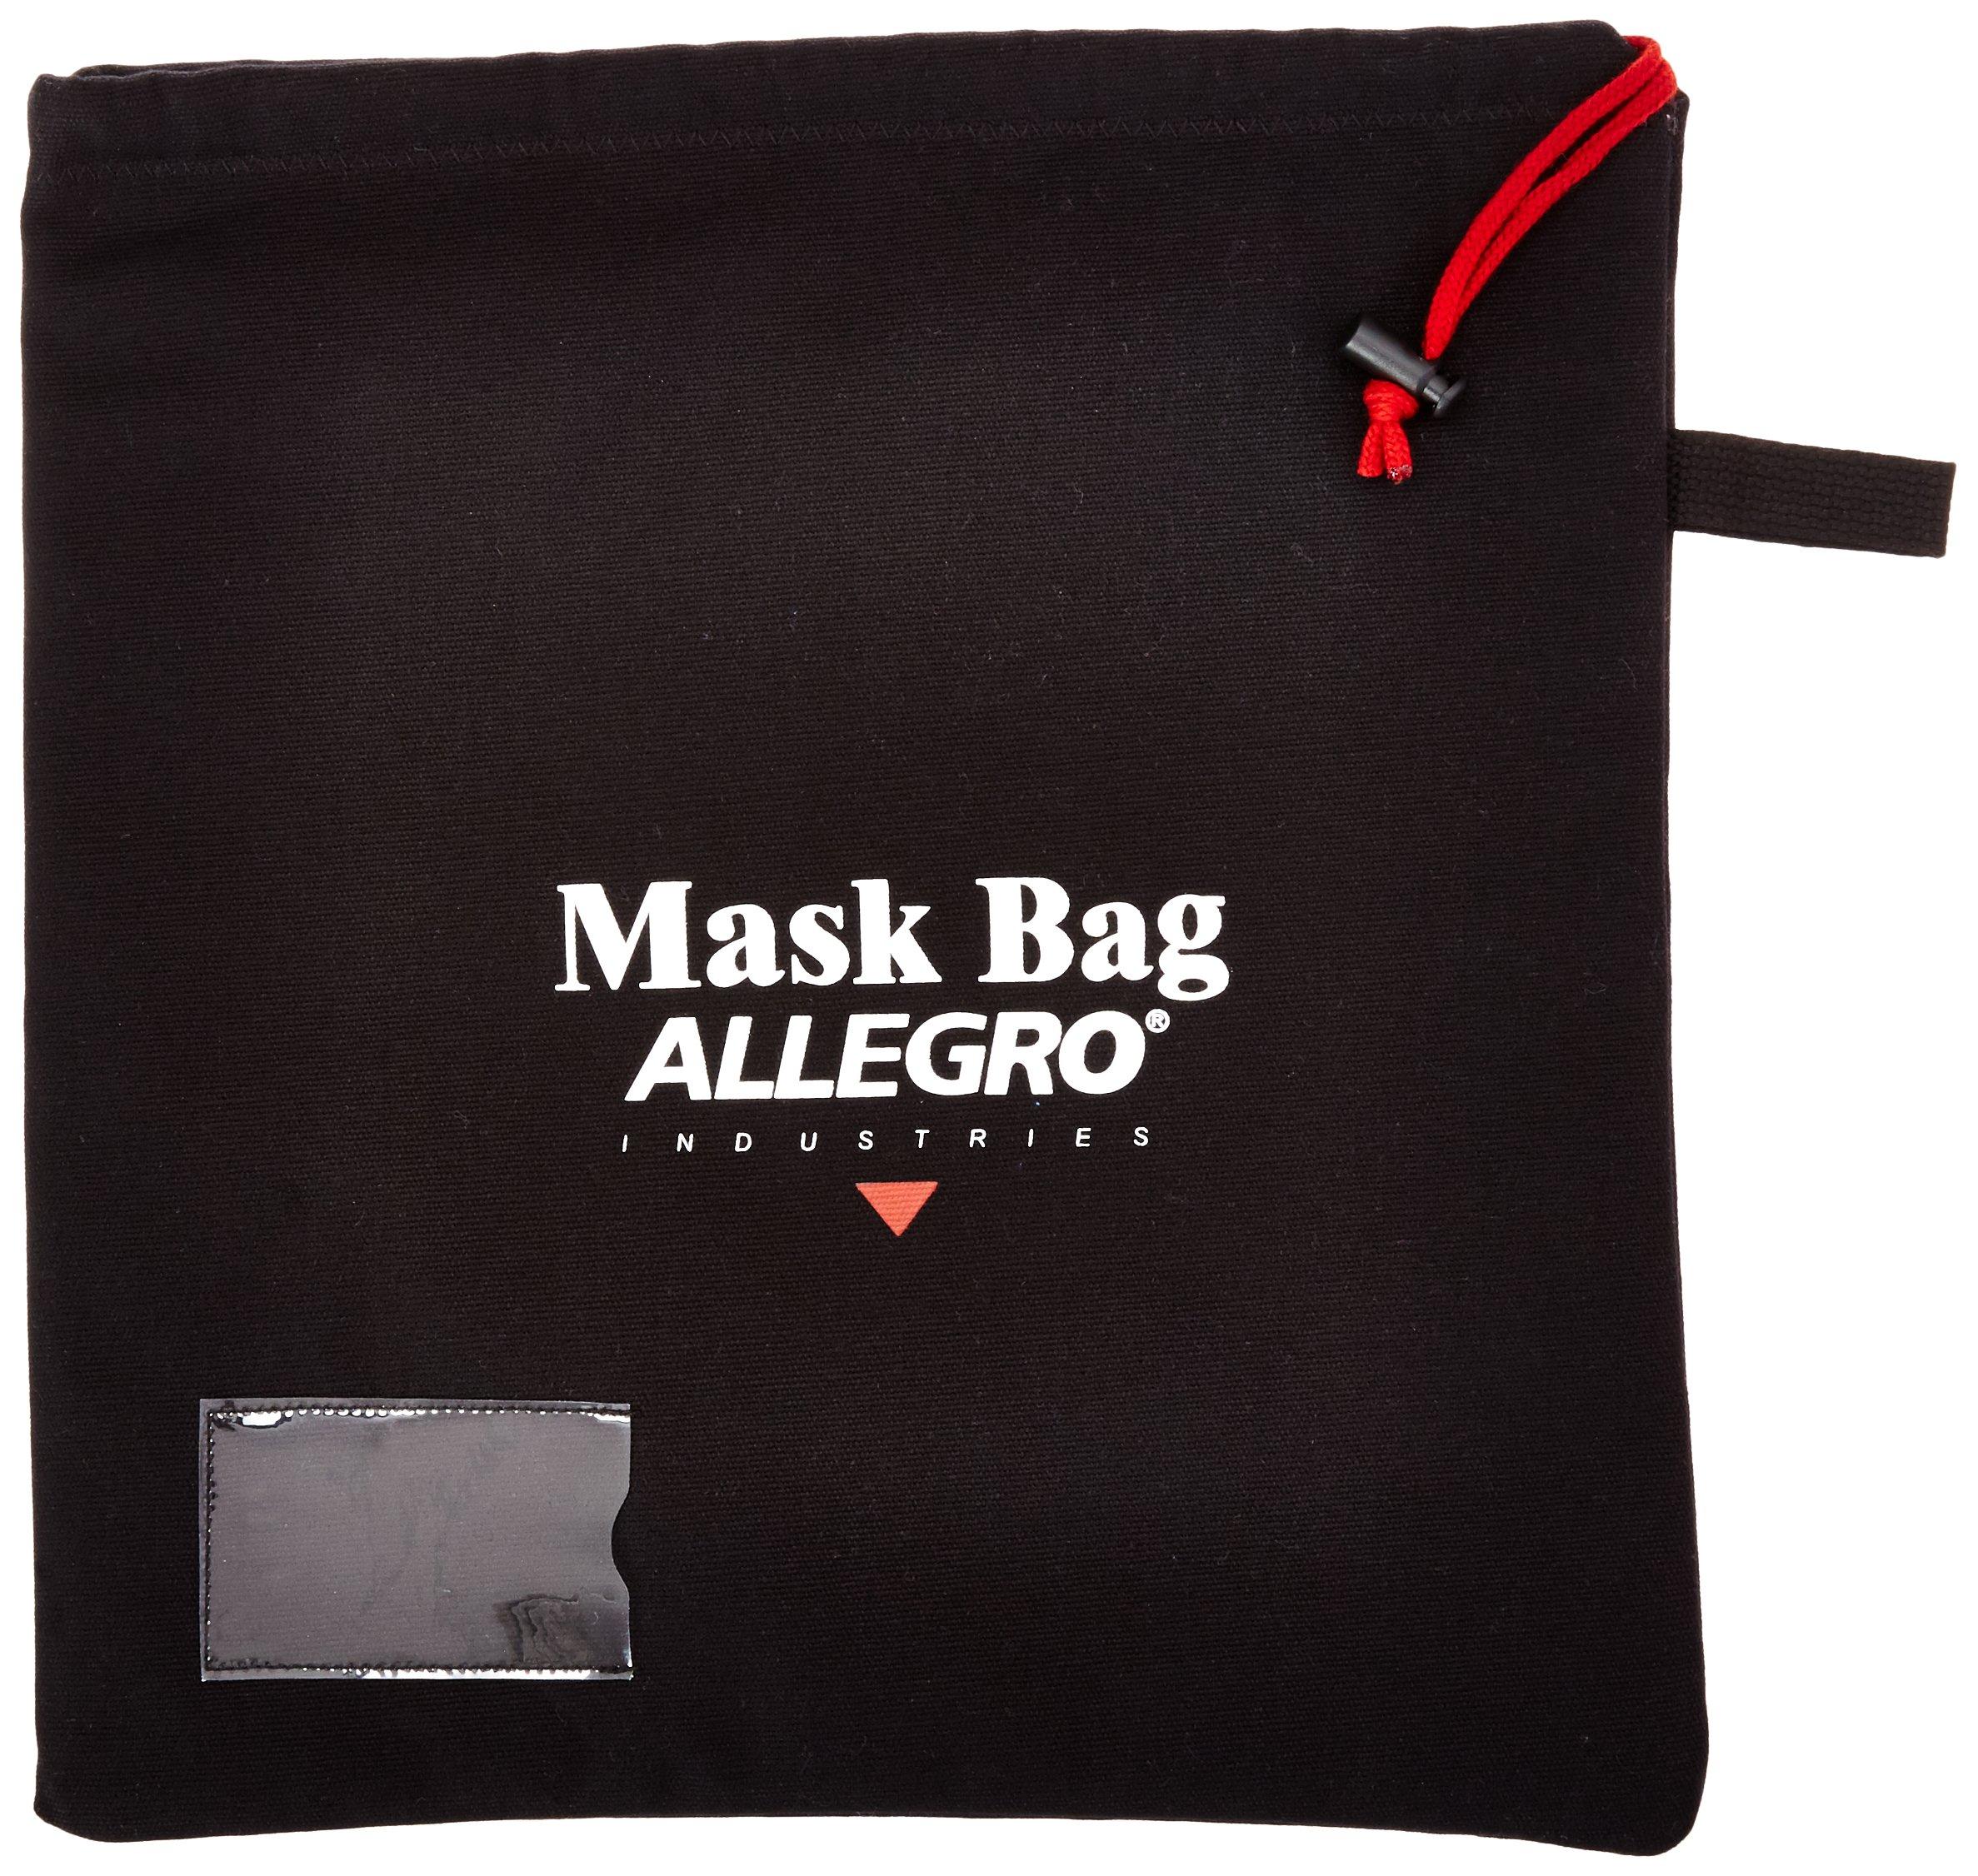 Allegro Industries 2025 Full Mask Storage Bag, 16'' x 14'', Black